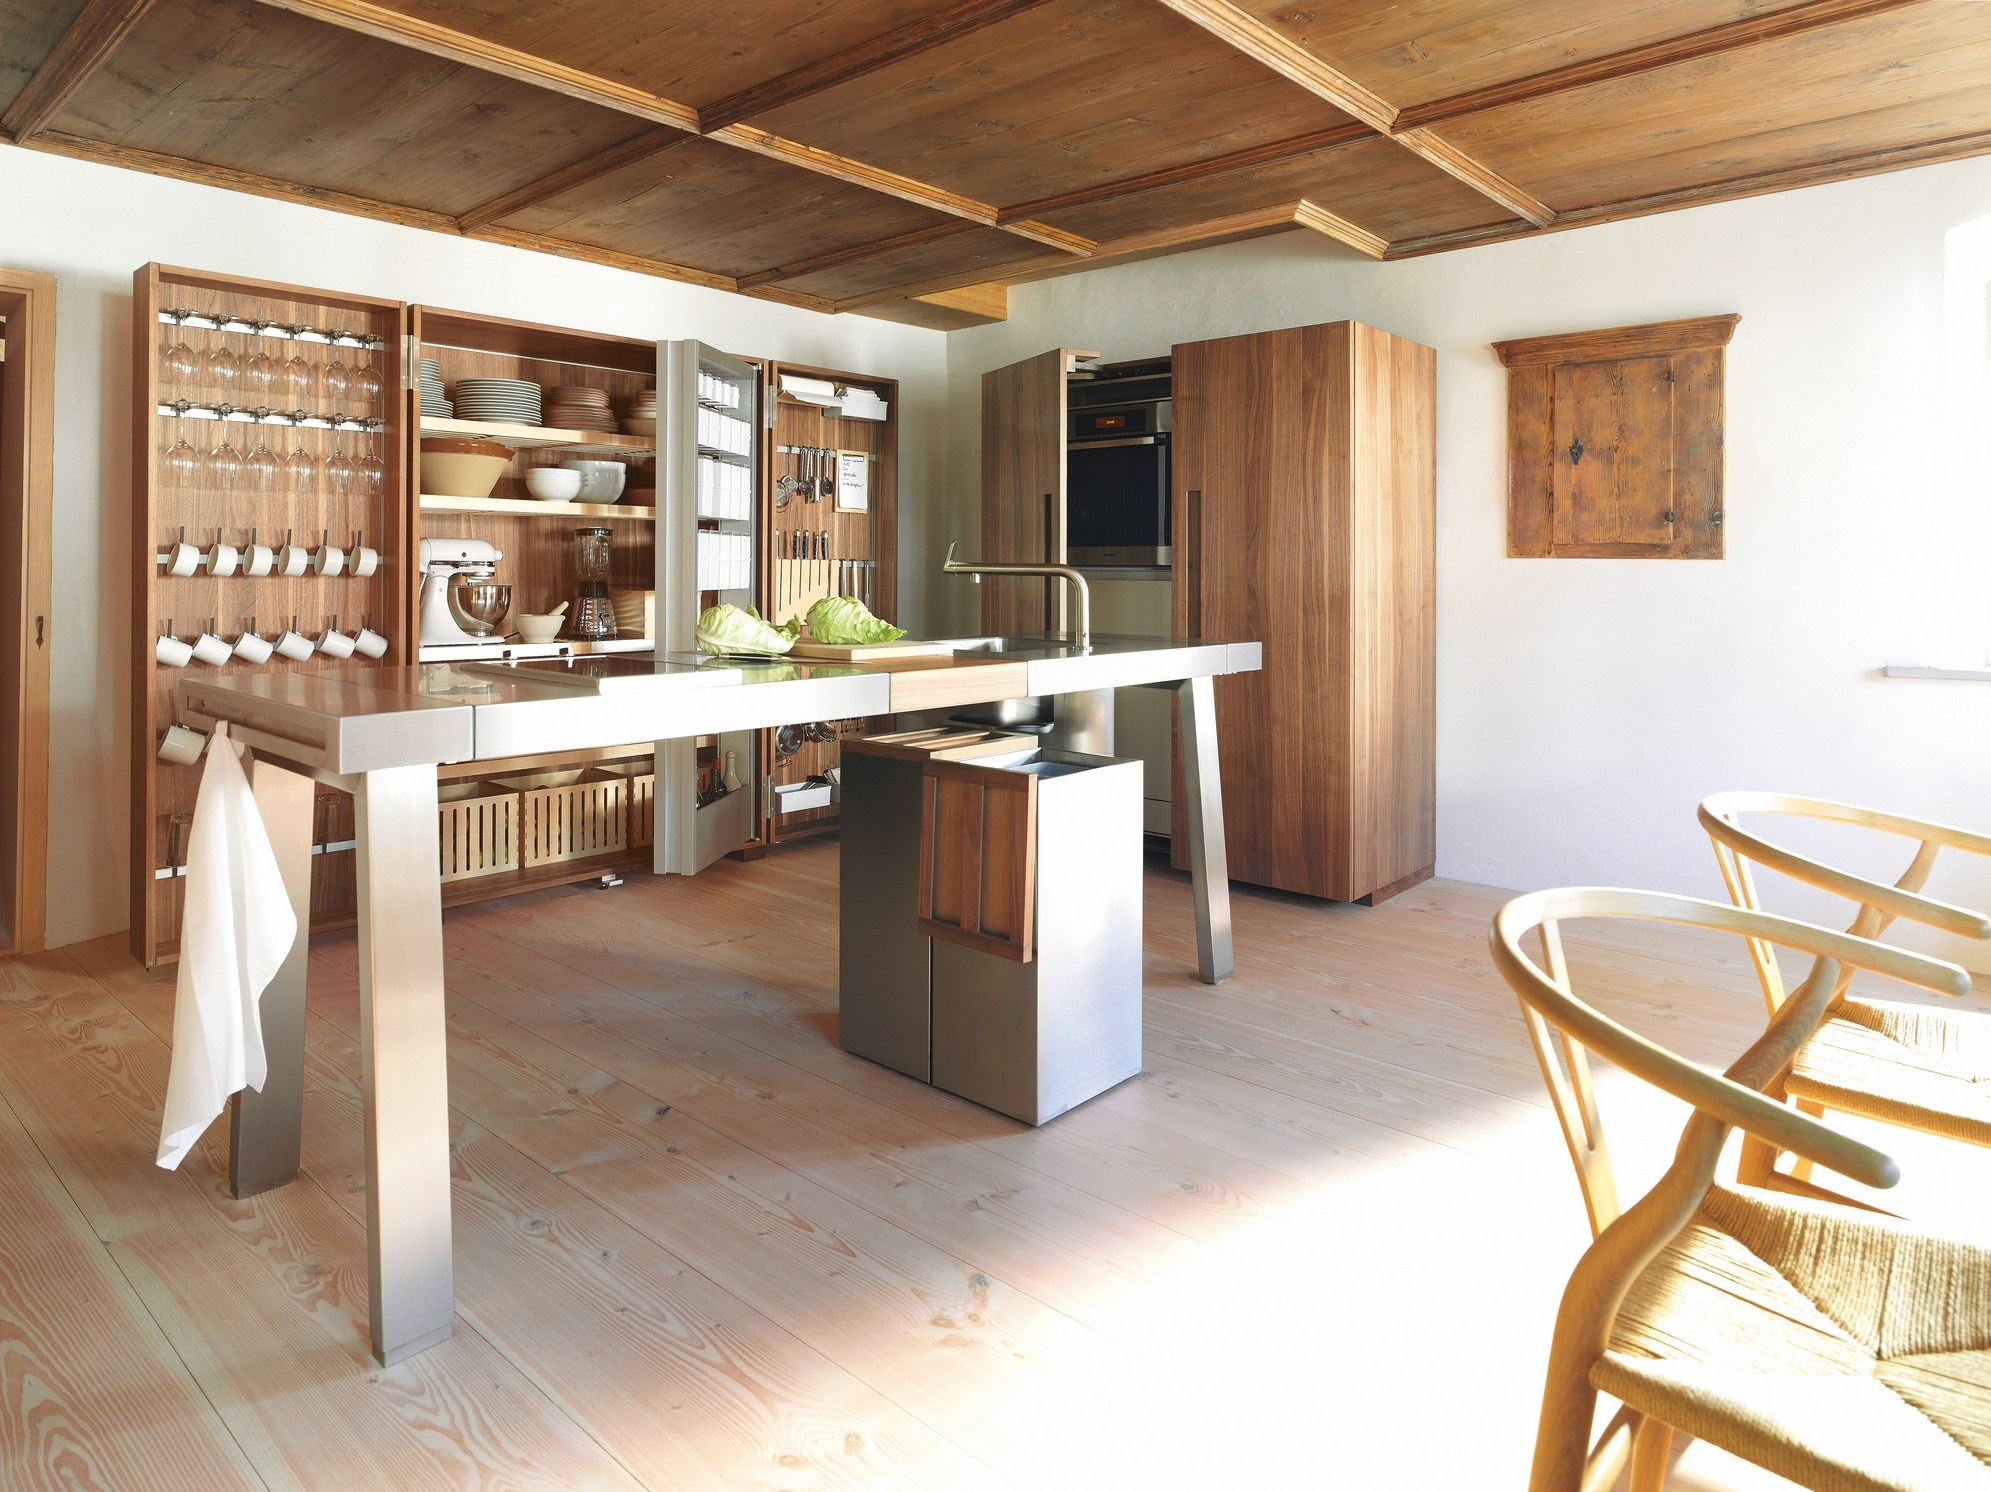 einbauk che b2 by bulthaup design eoos. Black Bedroom Furniture Sets. Home Design Ideas